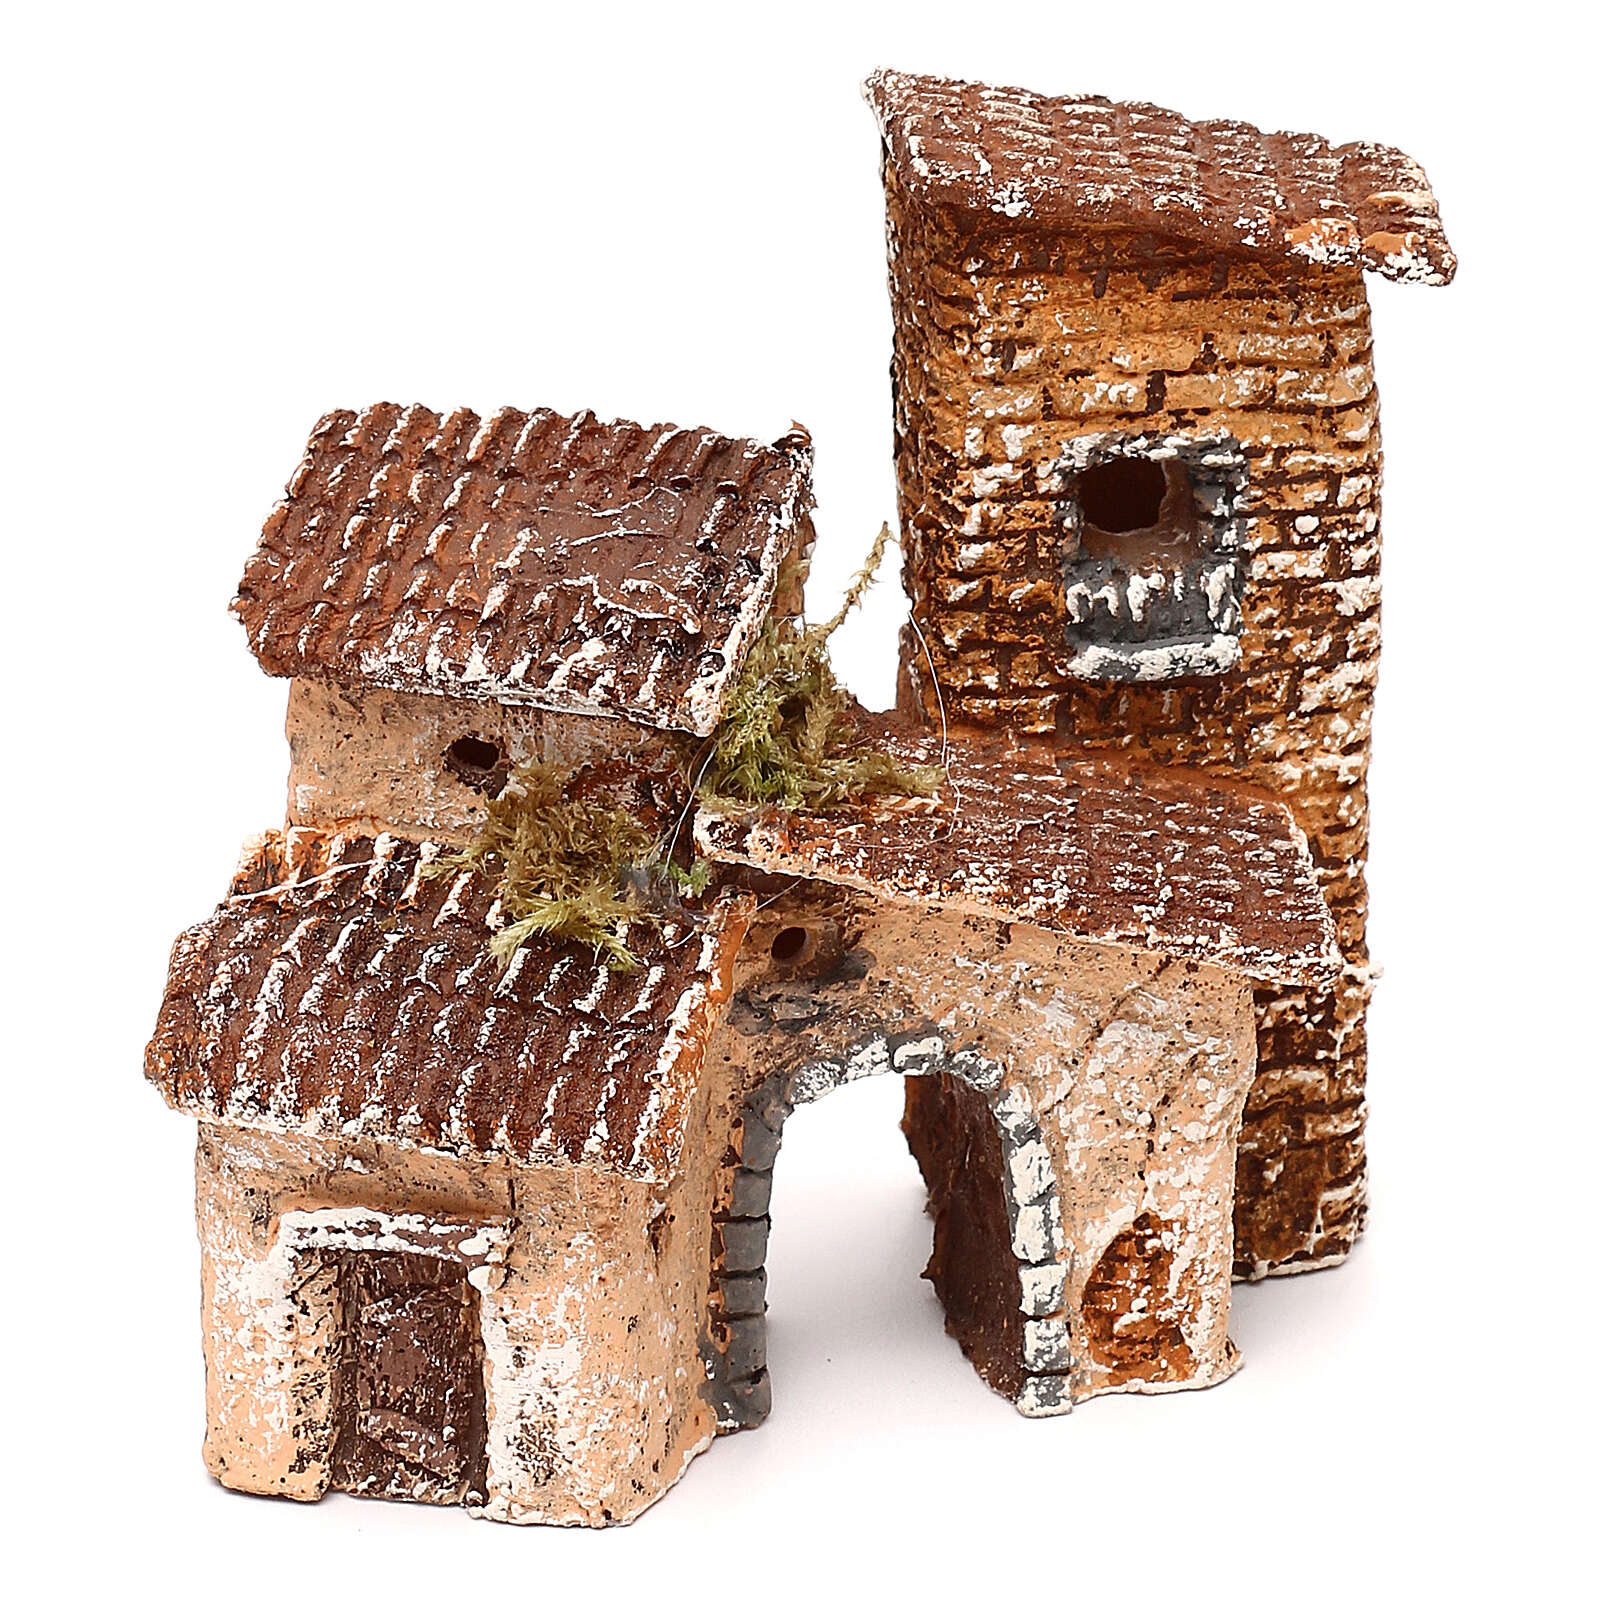 Nativity village with archway 10x10x10 cm for Neapolitan nativity 3-4 cm 4